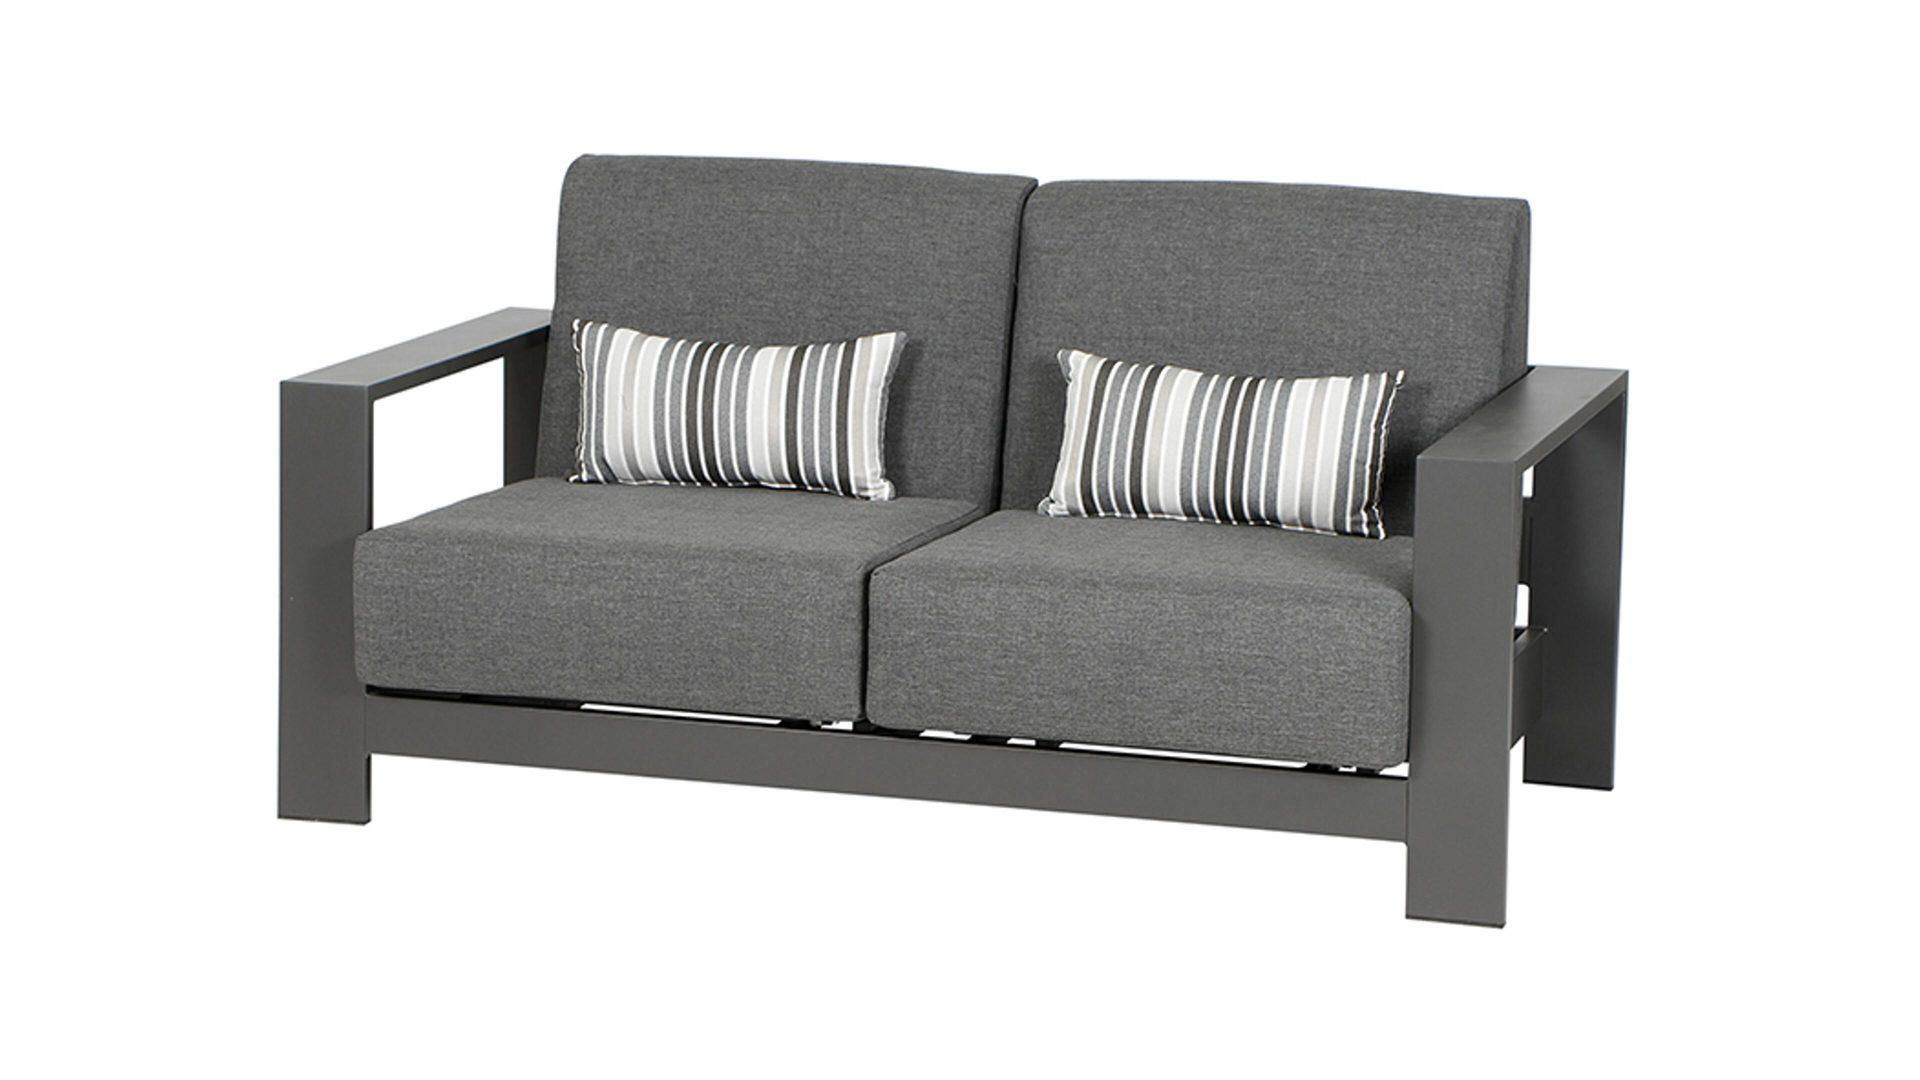 Lounge Sofa Grau Garten Siena Garden Lounge Sofa 3 Sitzer Belia Grau